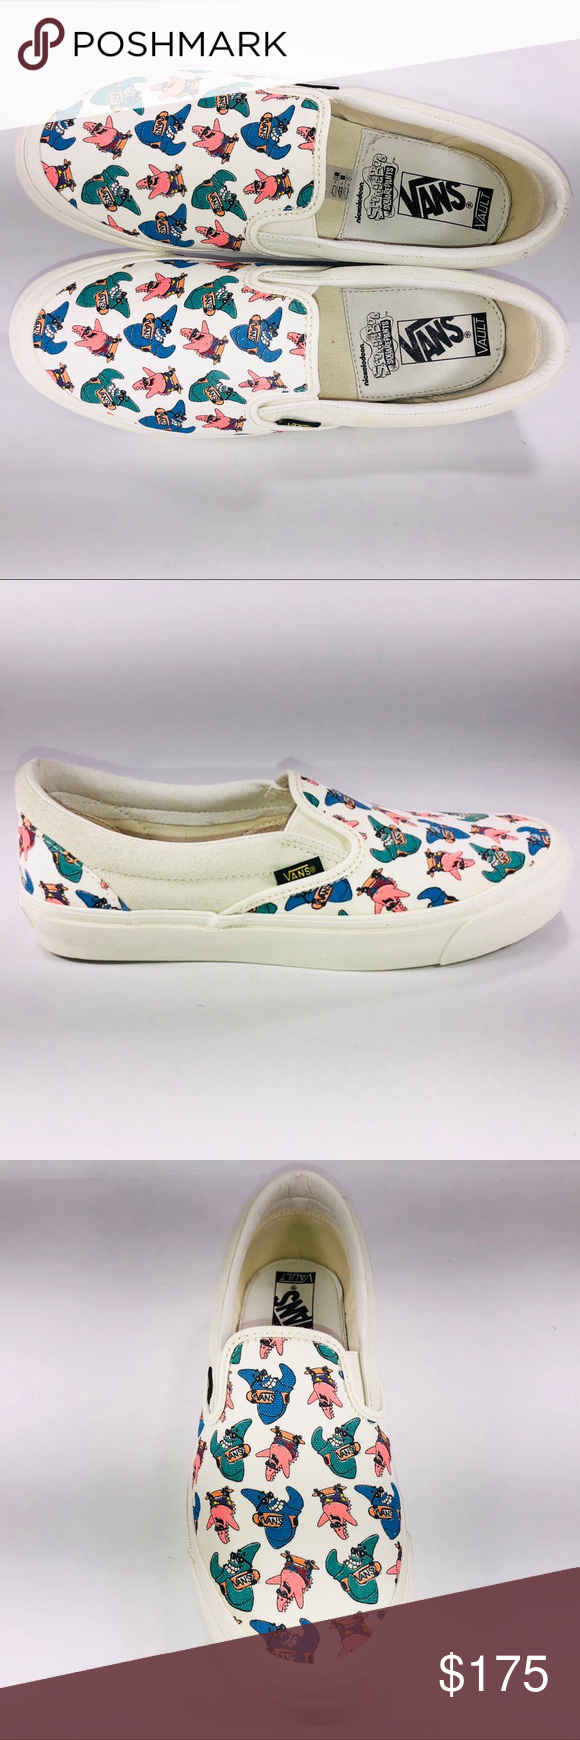 VANS Vault OG Classic Slip On Spongebob Patrick Multicolored Sneakers Mens  Size VN000UDFQM1 Vans Shoes Sneakers 3ba069ed70